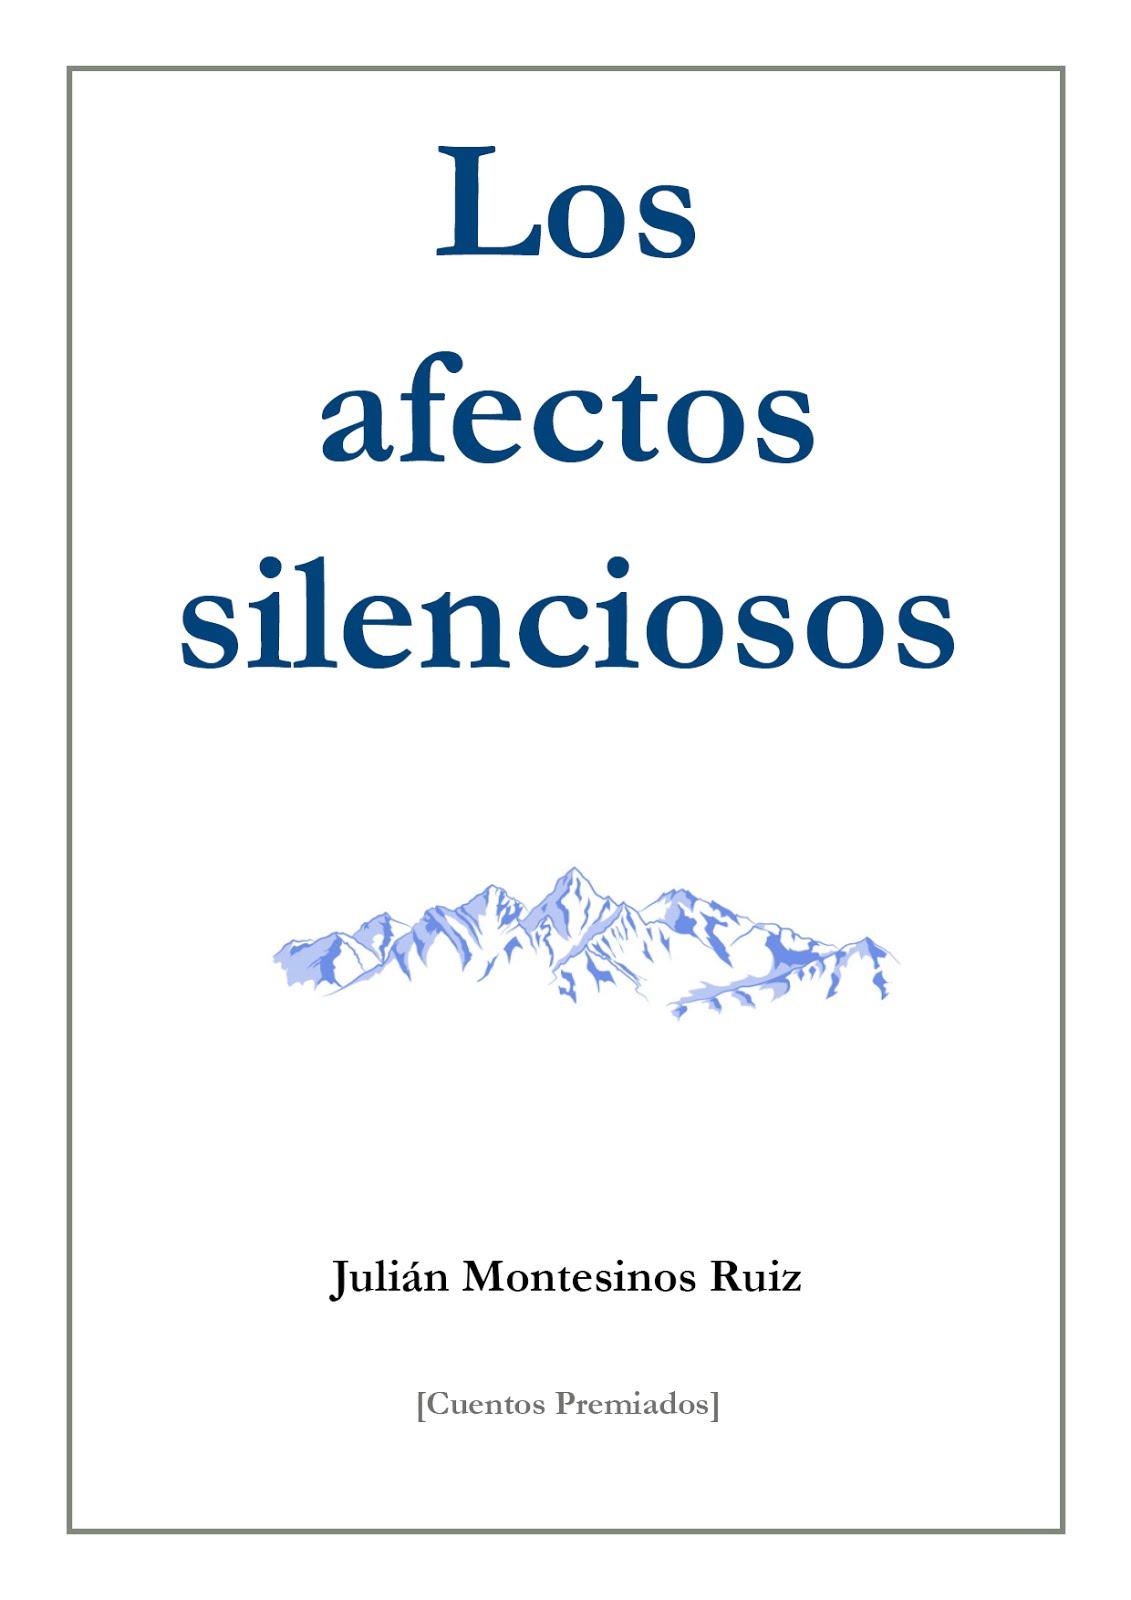 DESCARGA: LOS AFECTOS SILENCIOSOS